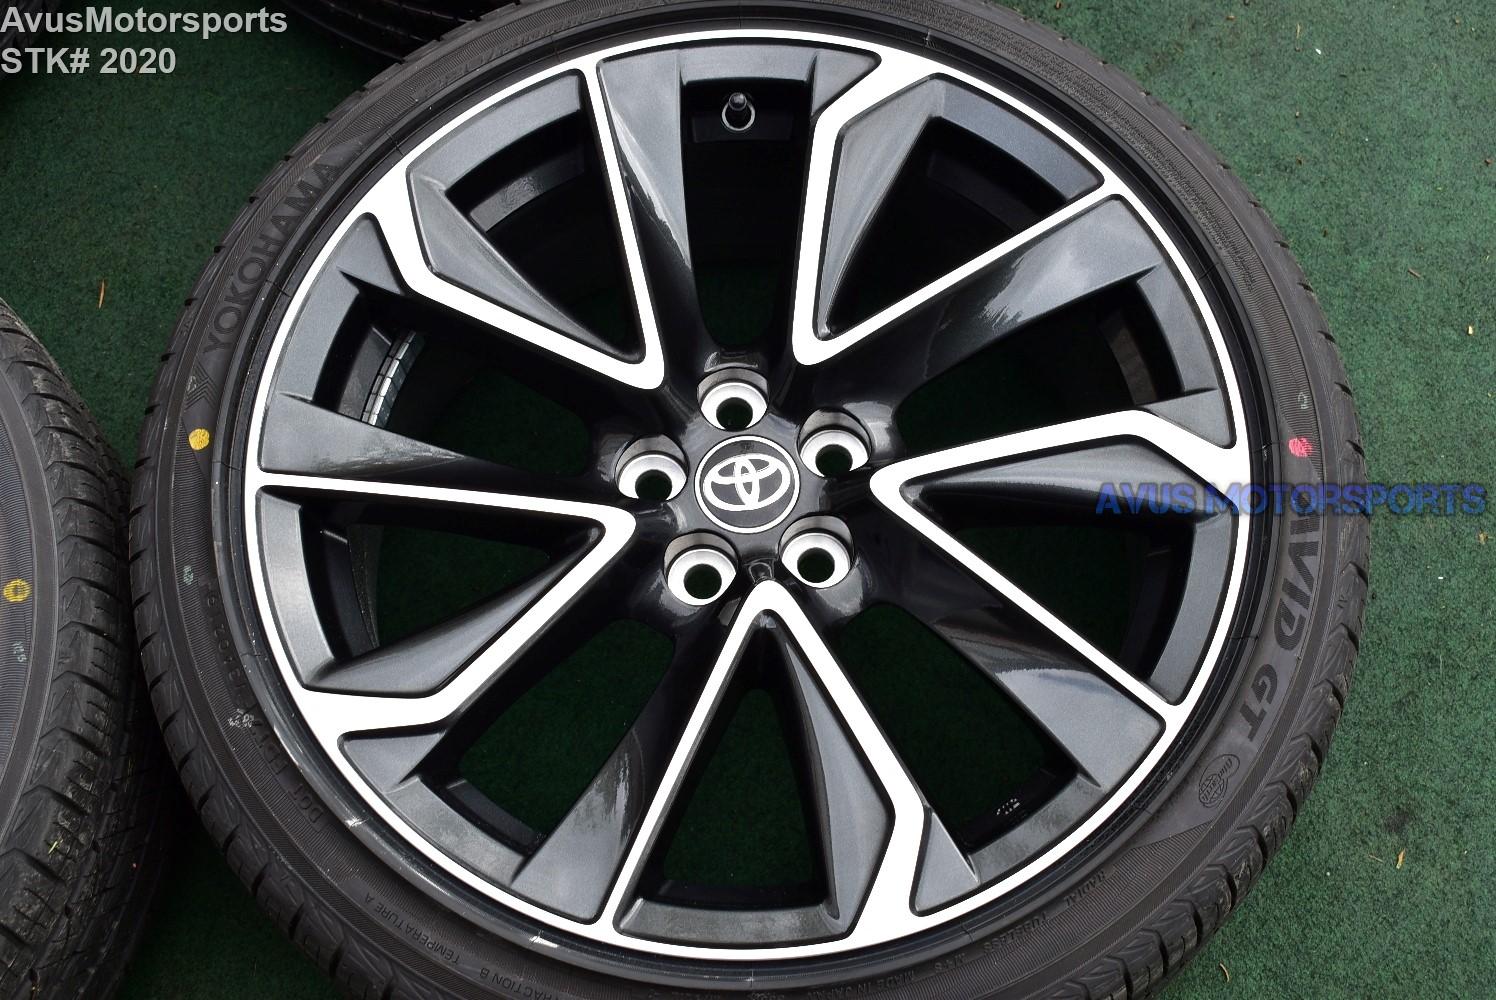 18 Quot Toyota Corolla Xse Factory Oem Wheels Yokohama 225 40r18 Prius 2019 5x100